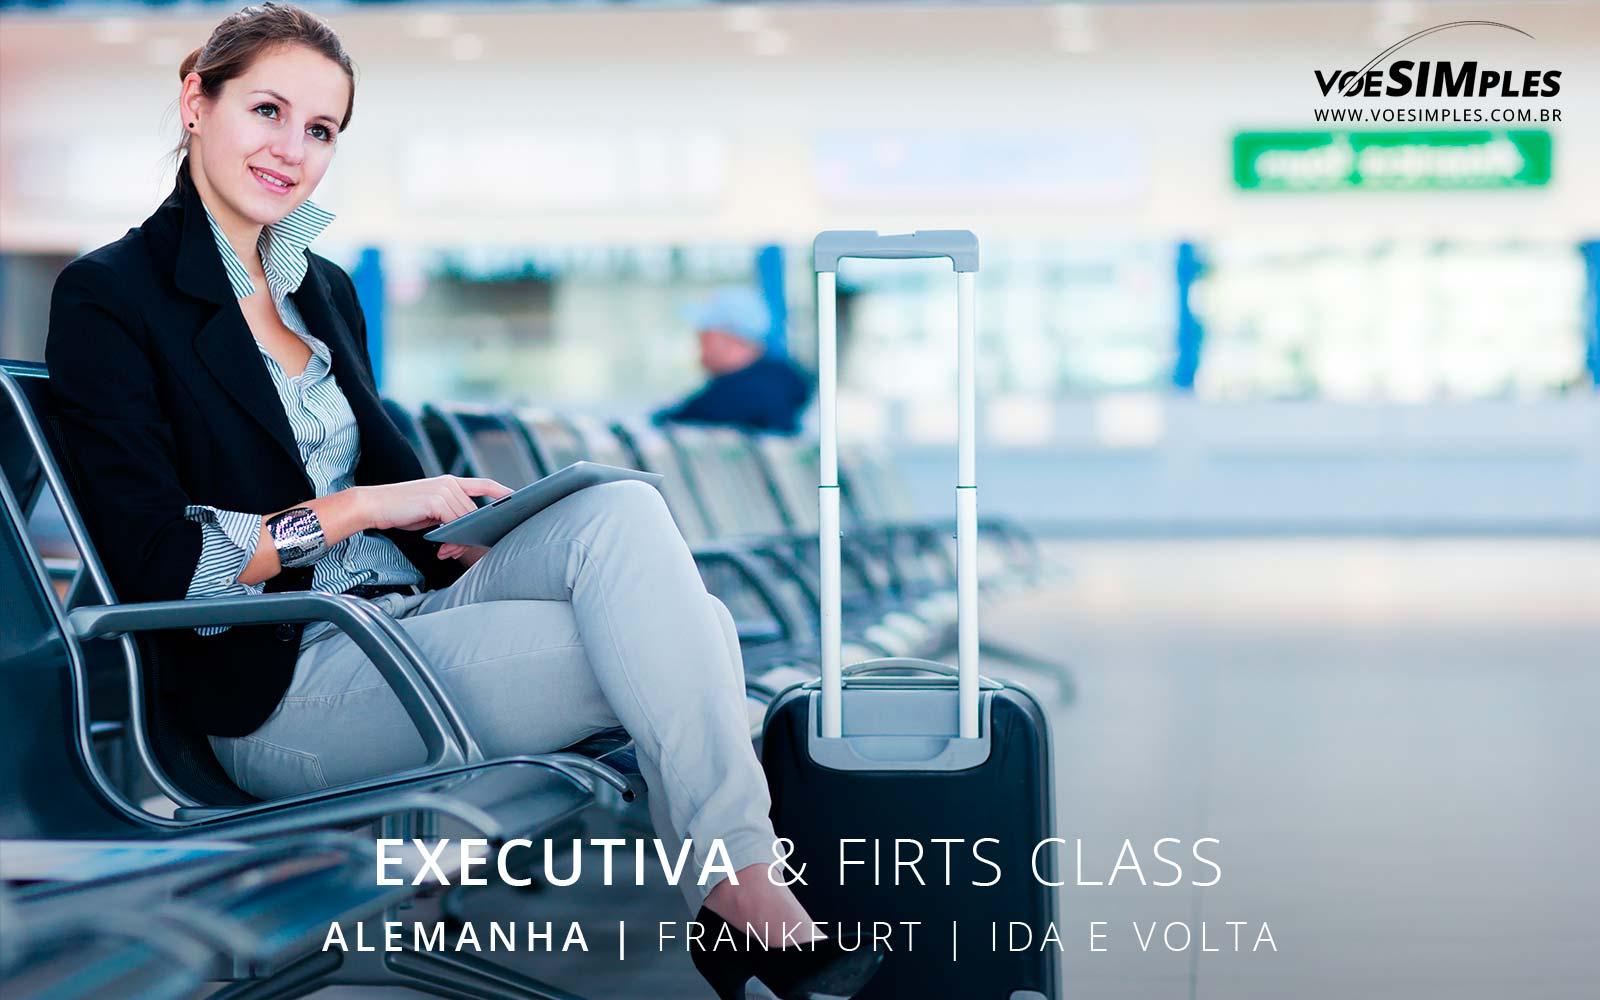 Passagem aérea Classe Executiva Latam para Frankfurt